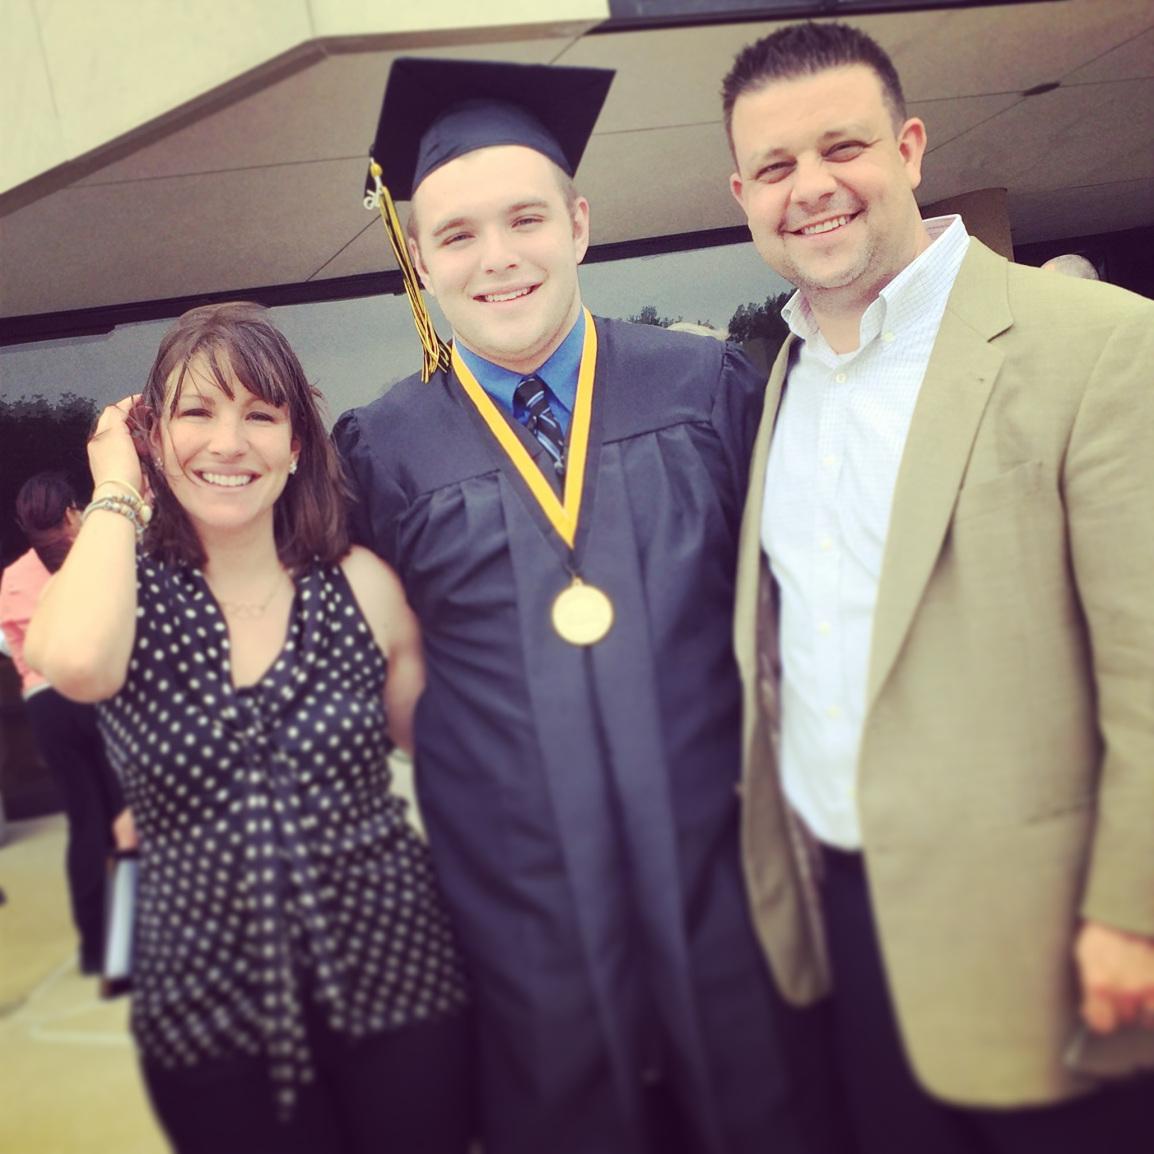 family at graduation